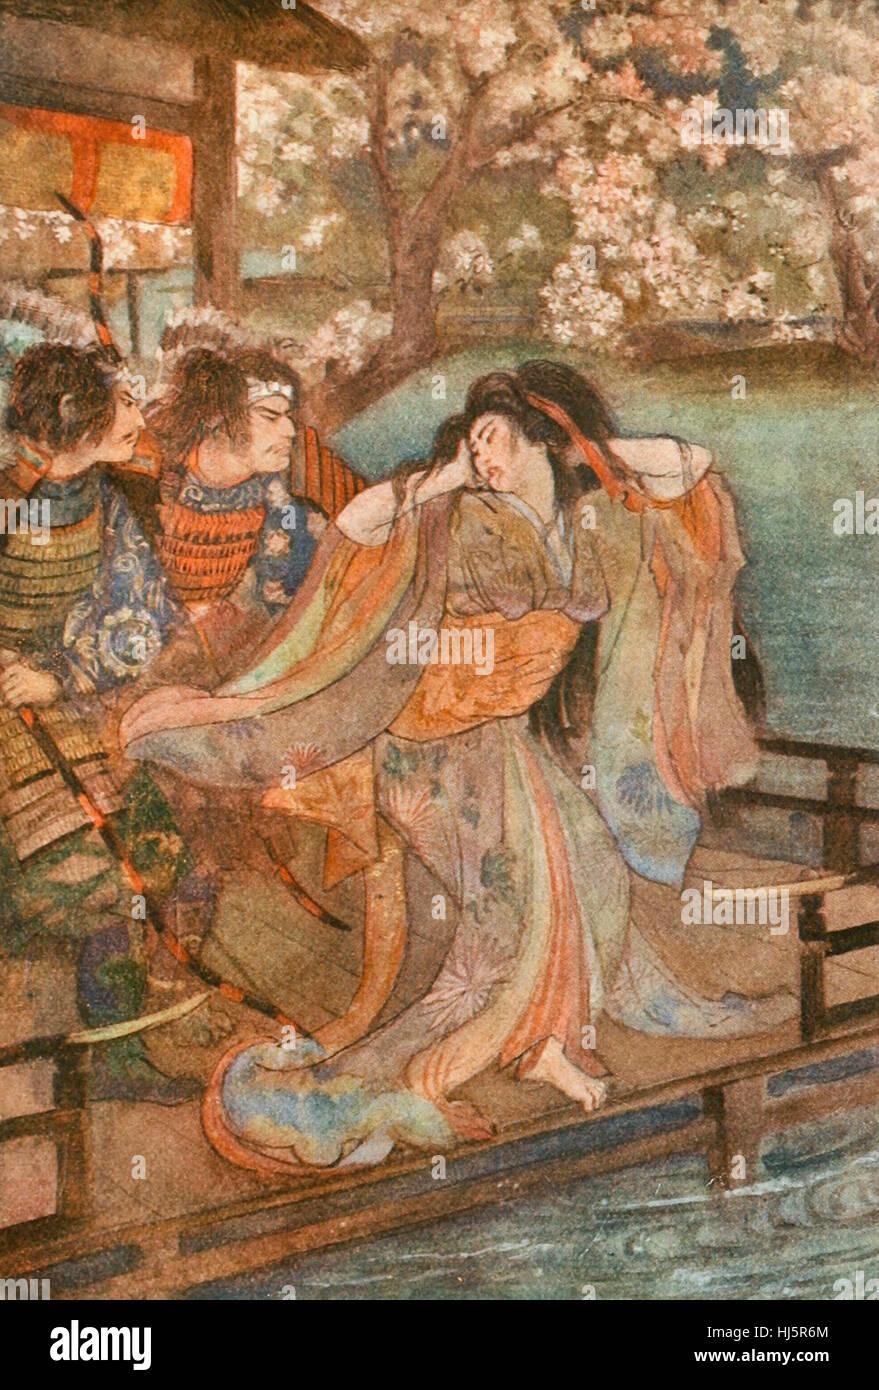 La Doncella de Unai, folclore japonés Imagen De Stock